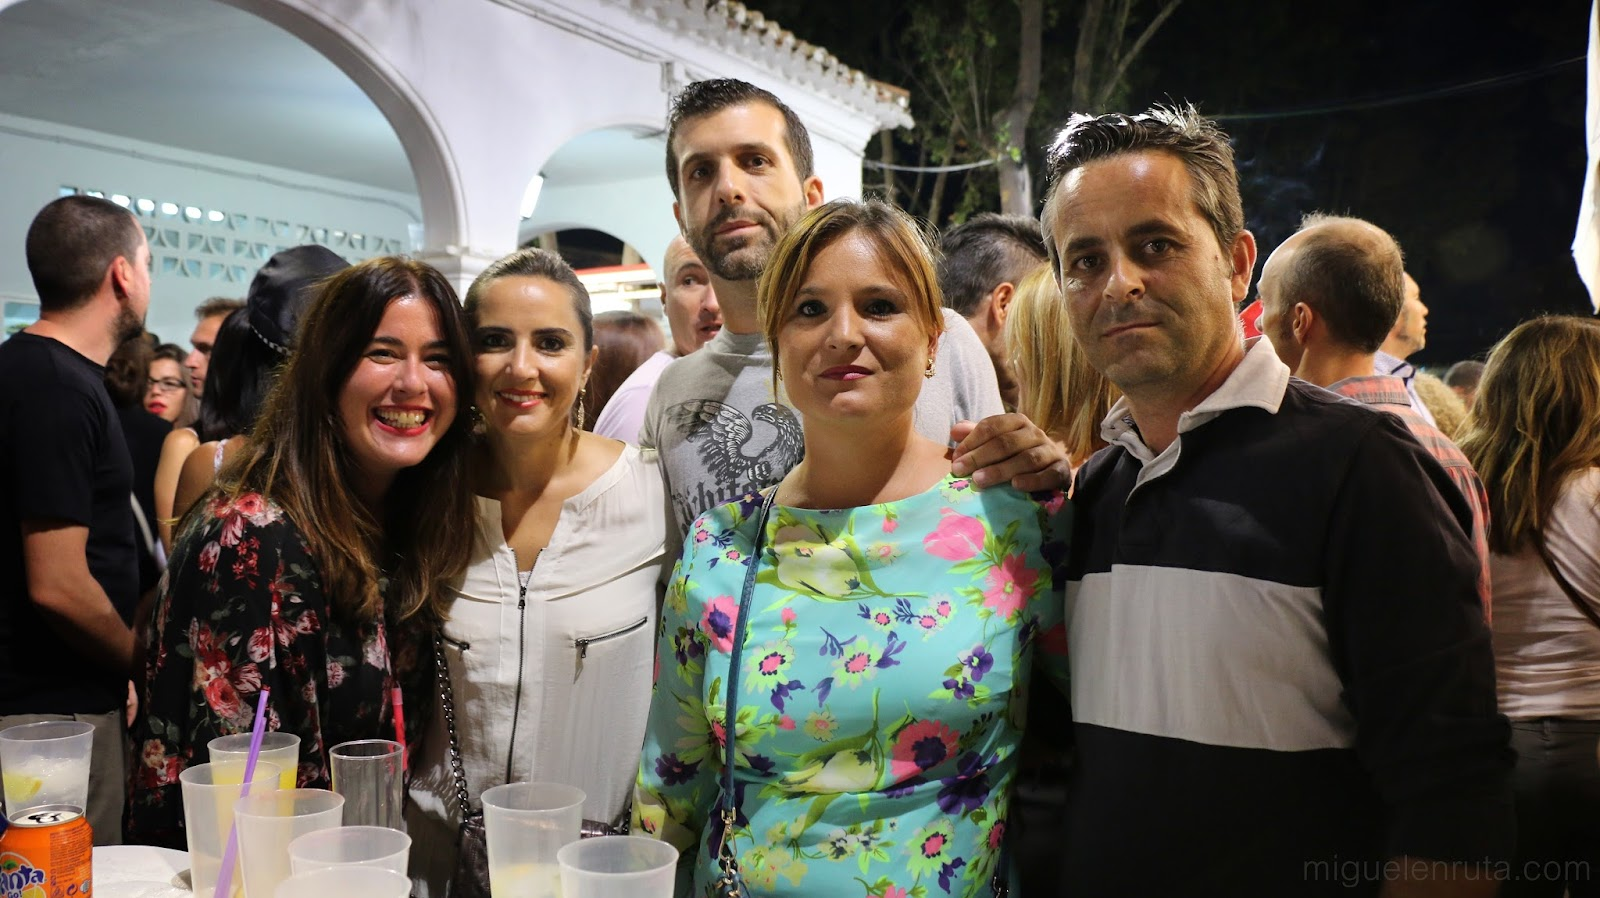 Fotos-retratos-Feria-de-Albacete_33